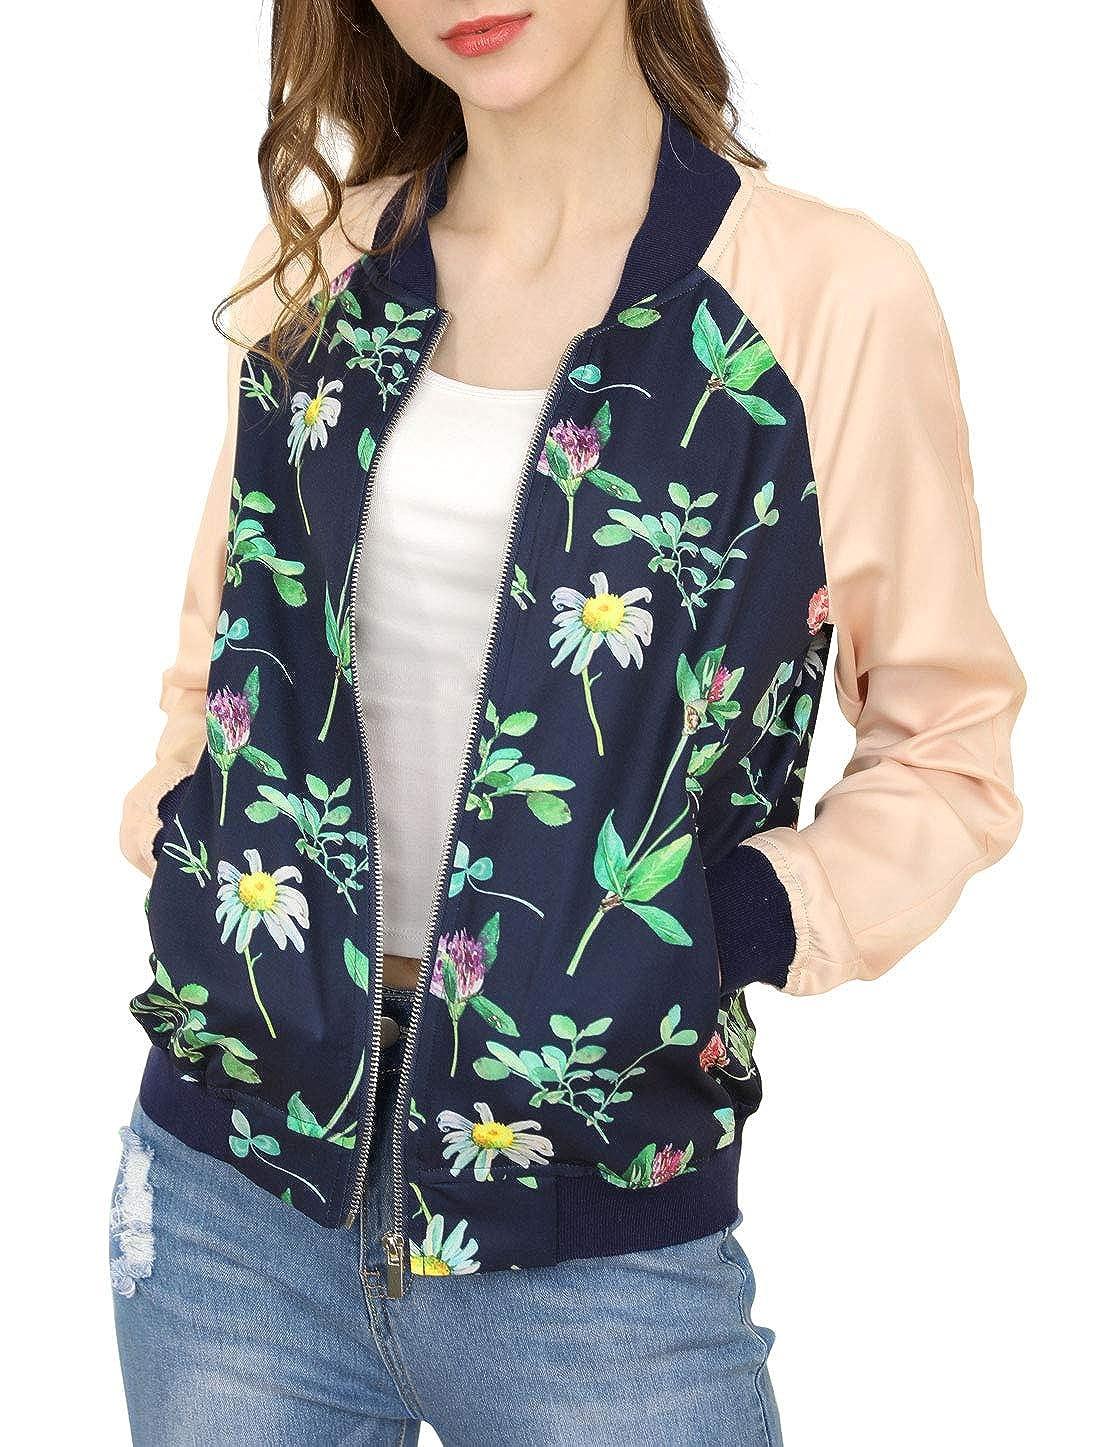 54fe908fb Allegra K Women's Floral Jackets Contrast Zip Up Light Weight Bomber ...